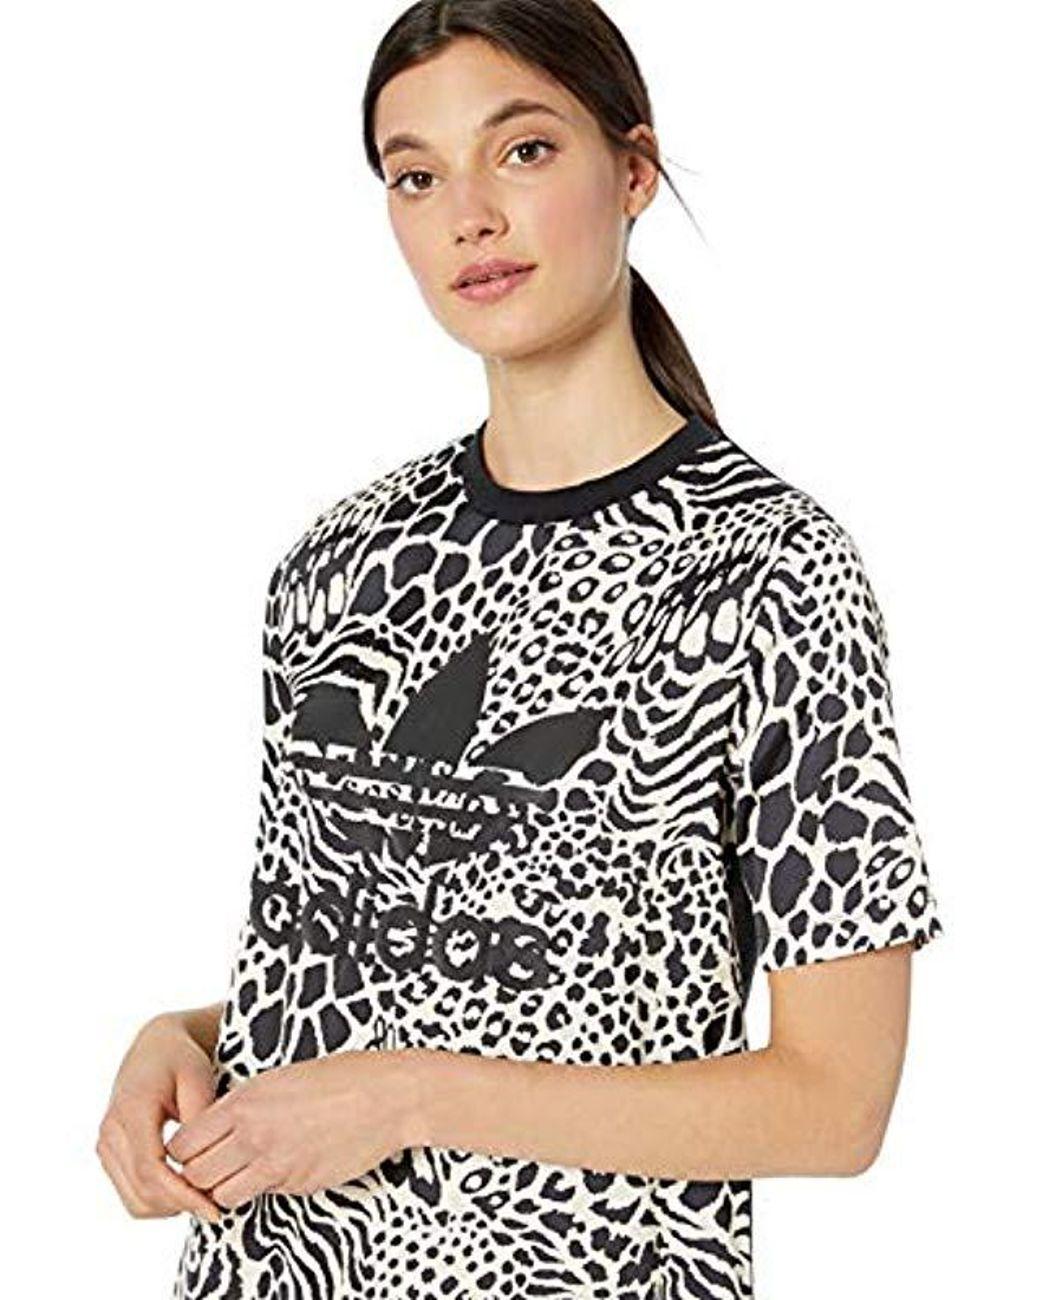 00de57518c0 adidas Originals Tee Dress All Over Print in Black - Lyst